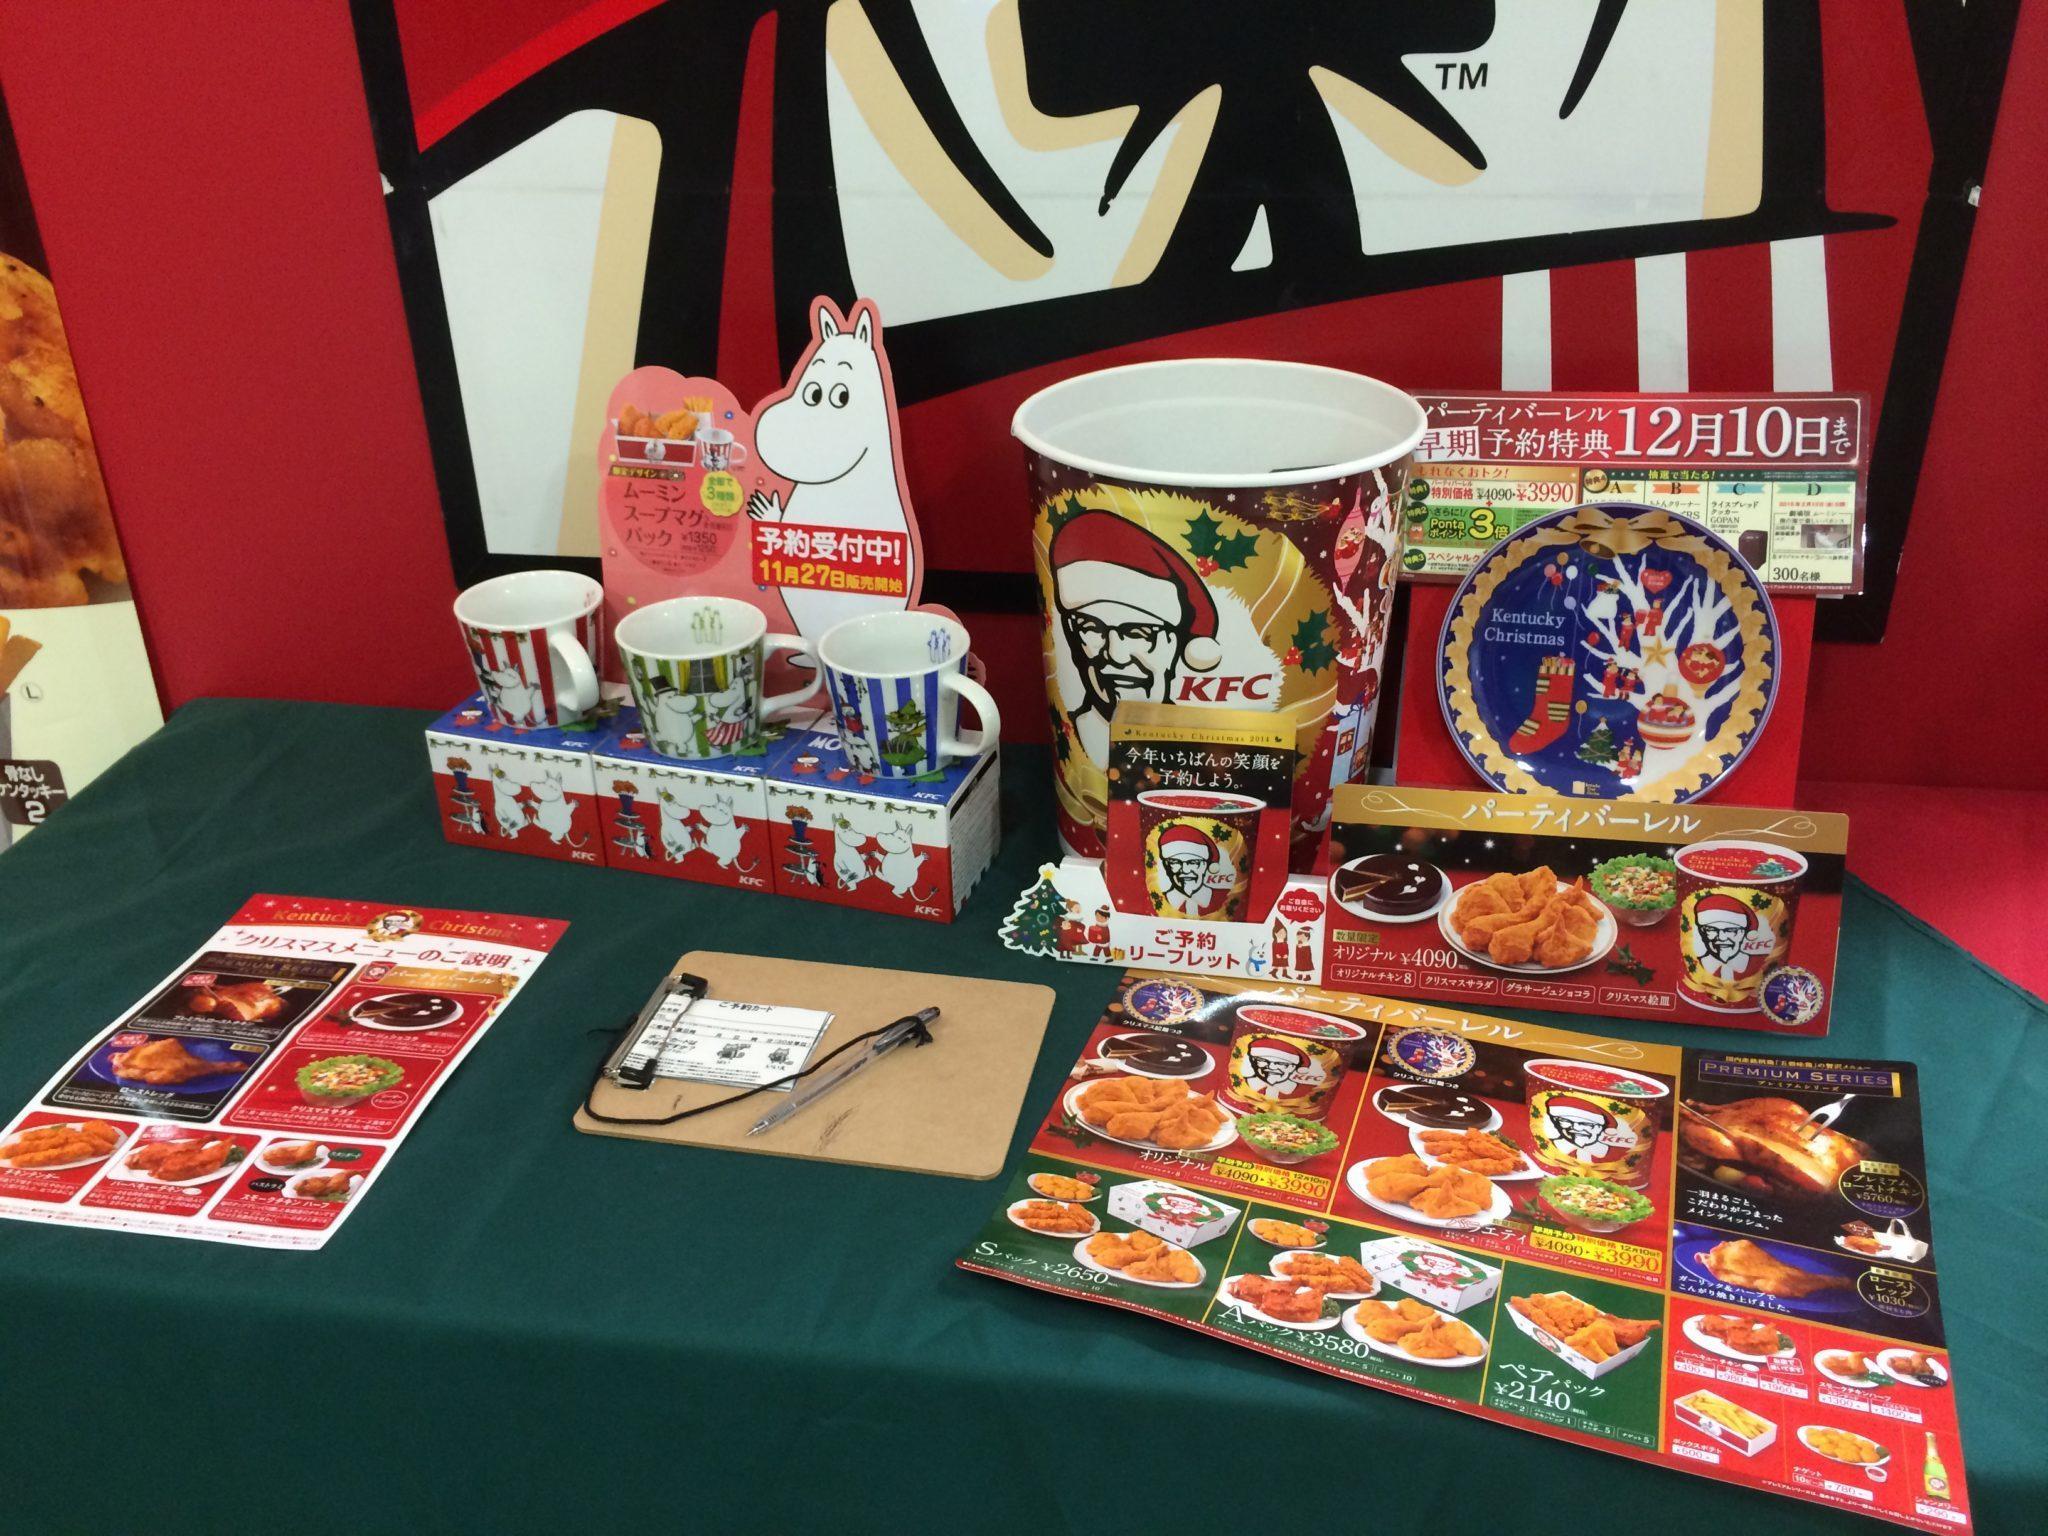 Kfc Christmas Japan.Christmas Dinner In Japan Kfc Reflections Enroute